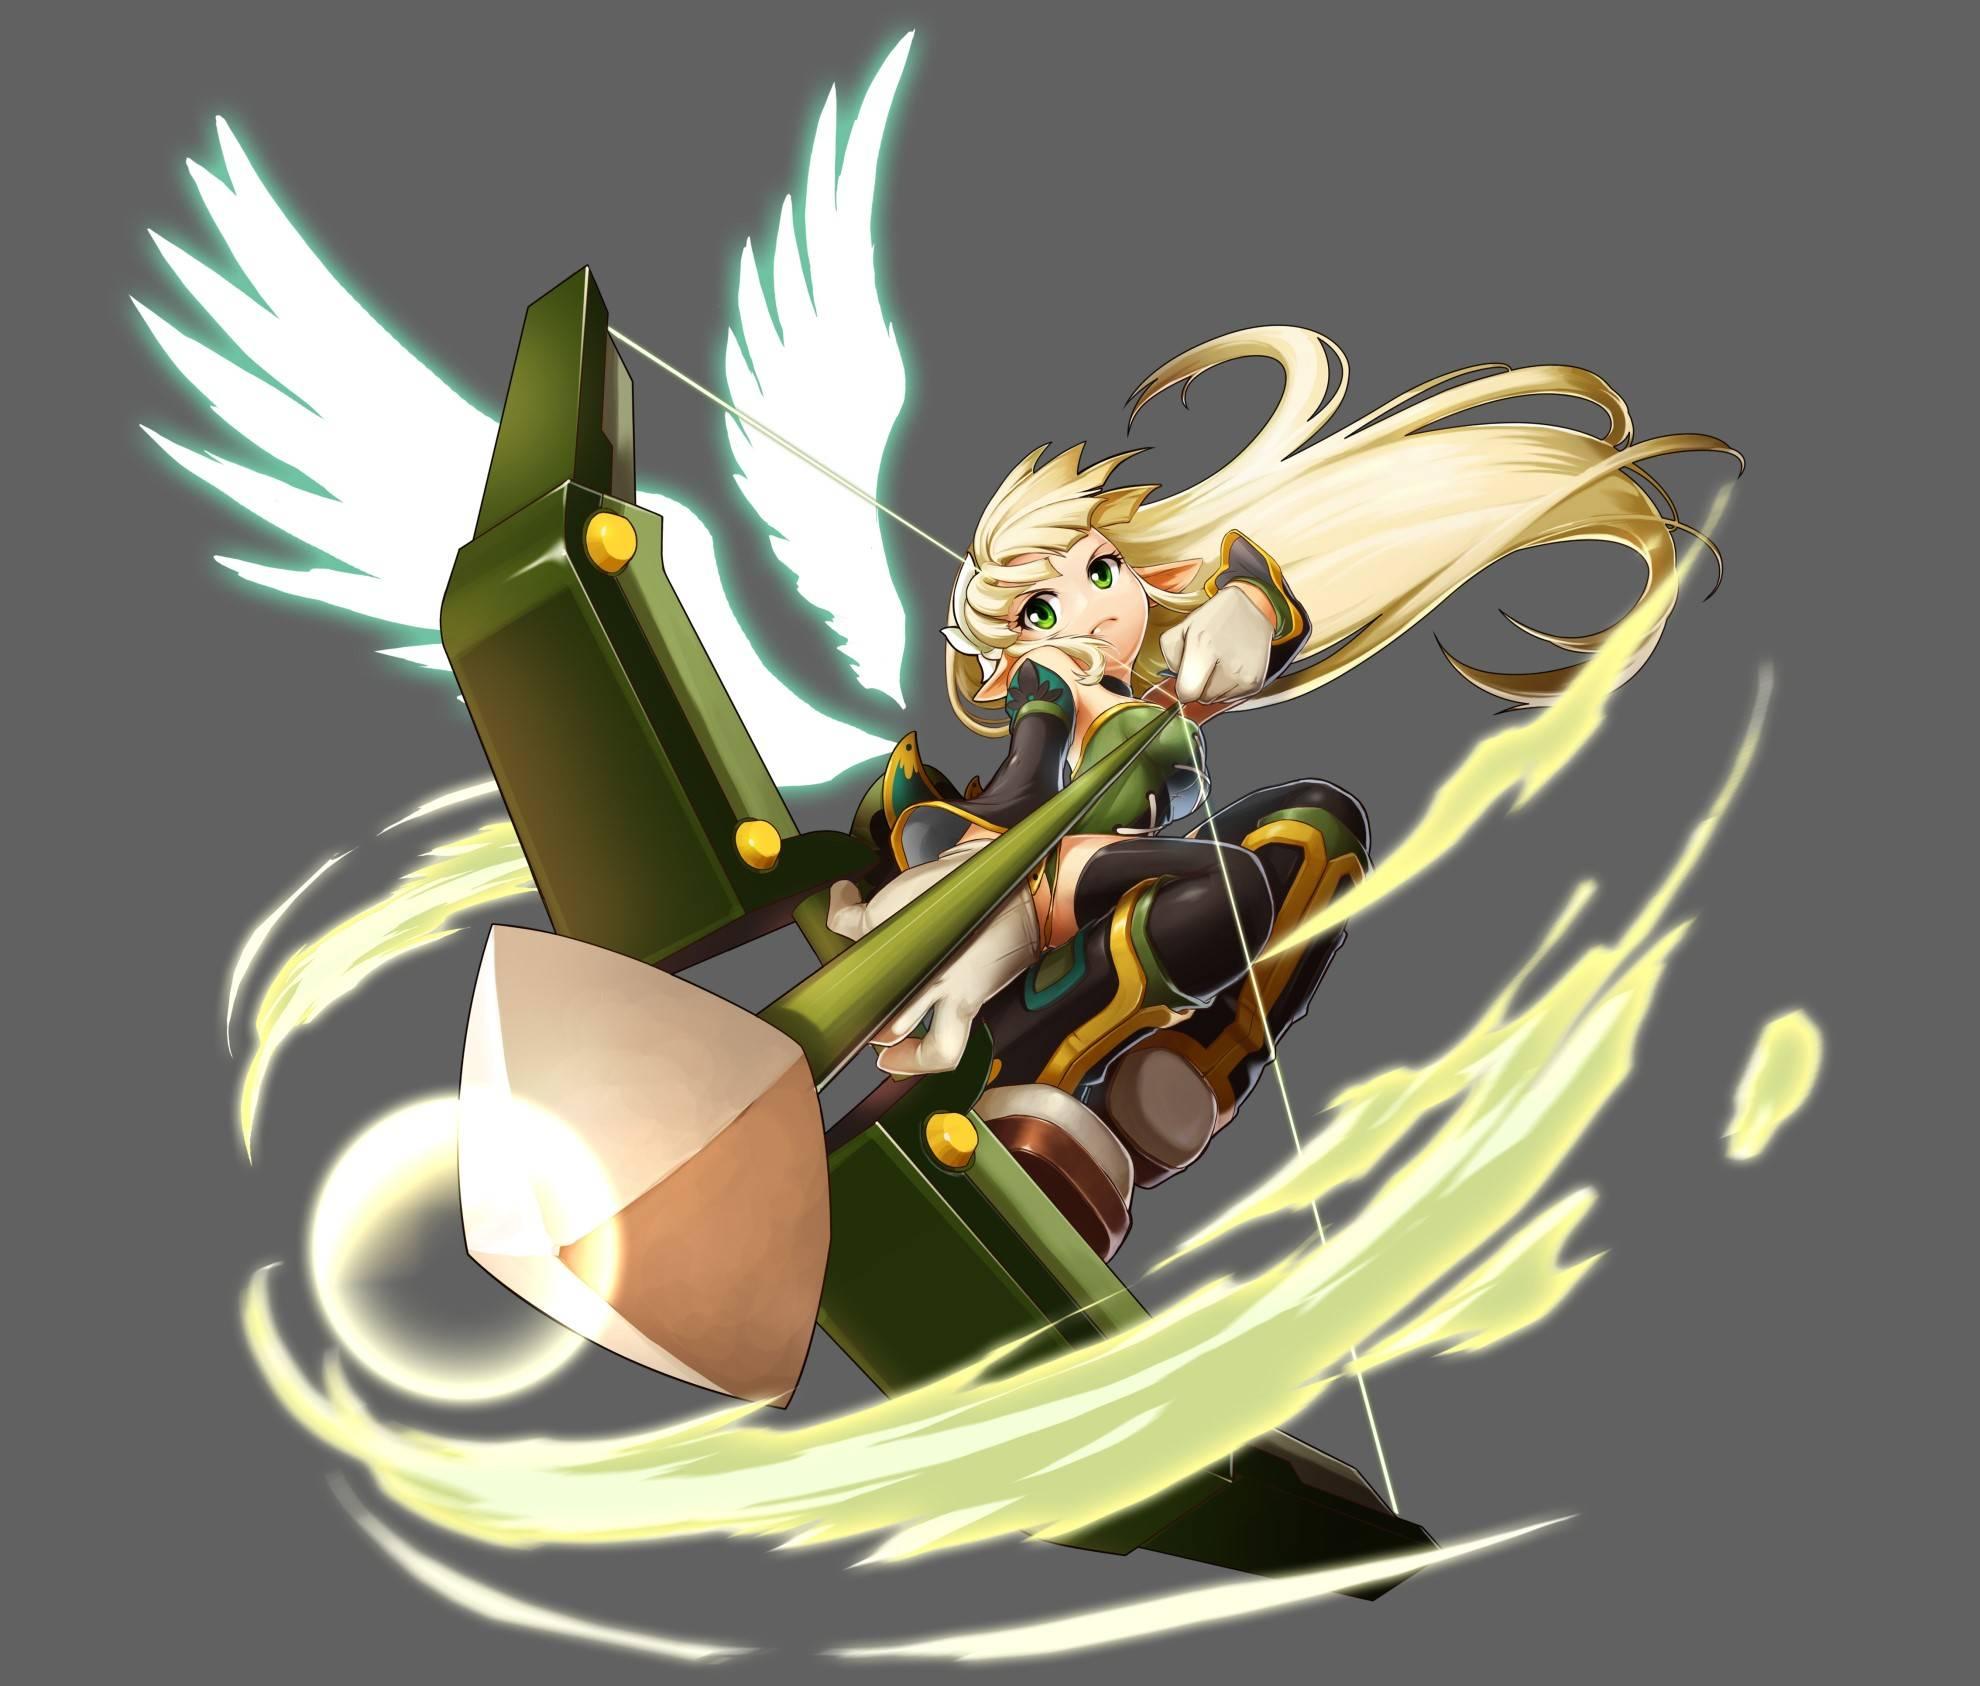 Juego Online mas parecido a Sword Art Online